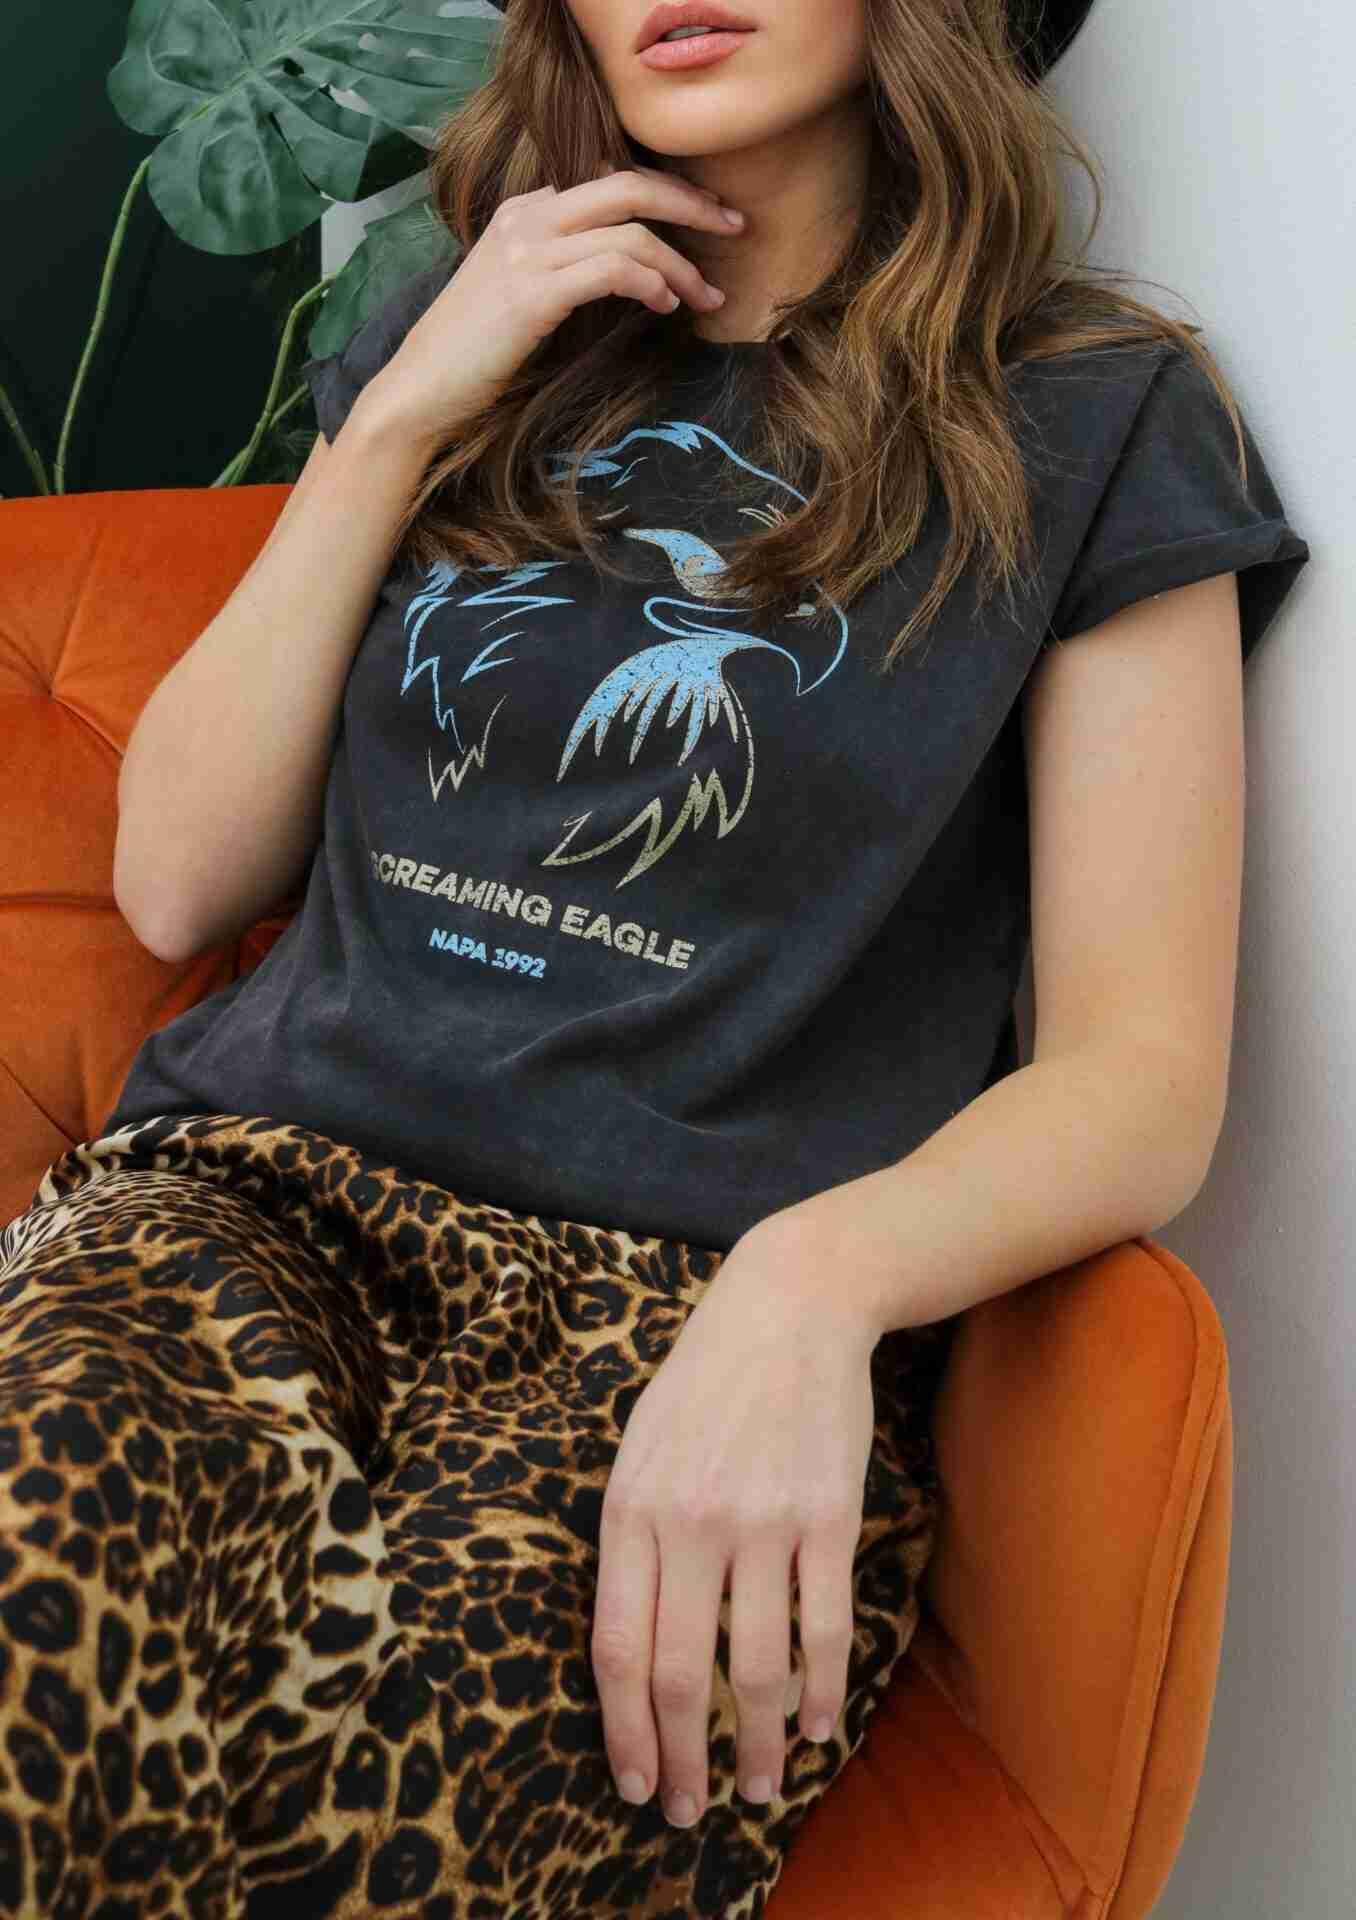 screaming eagle napa 92 t-shirt stone wash black | fwp by rae